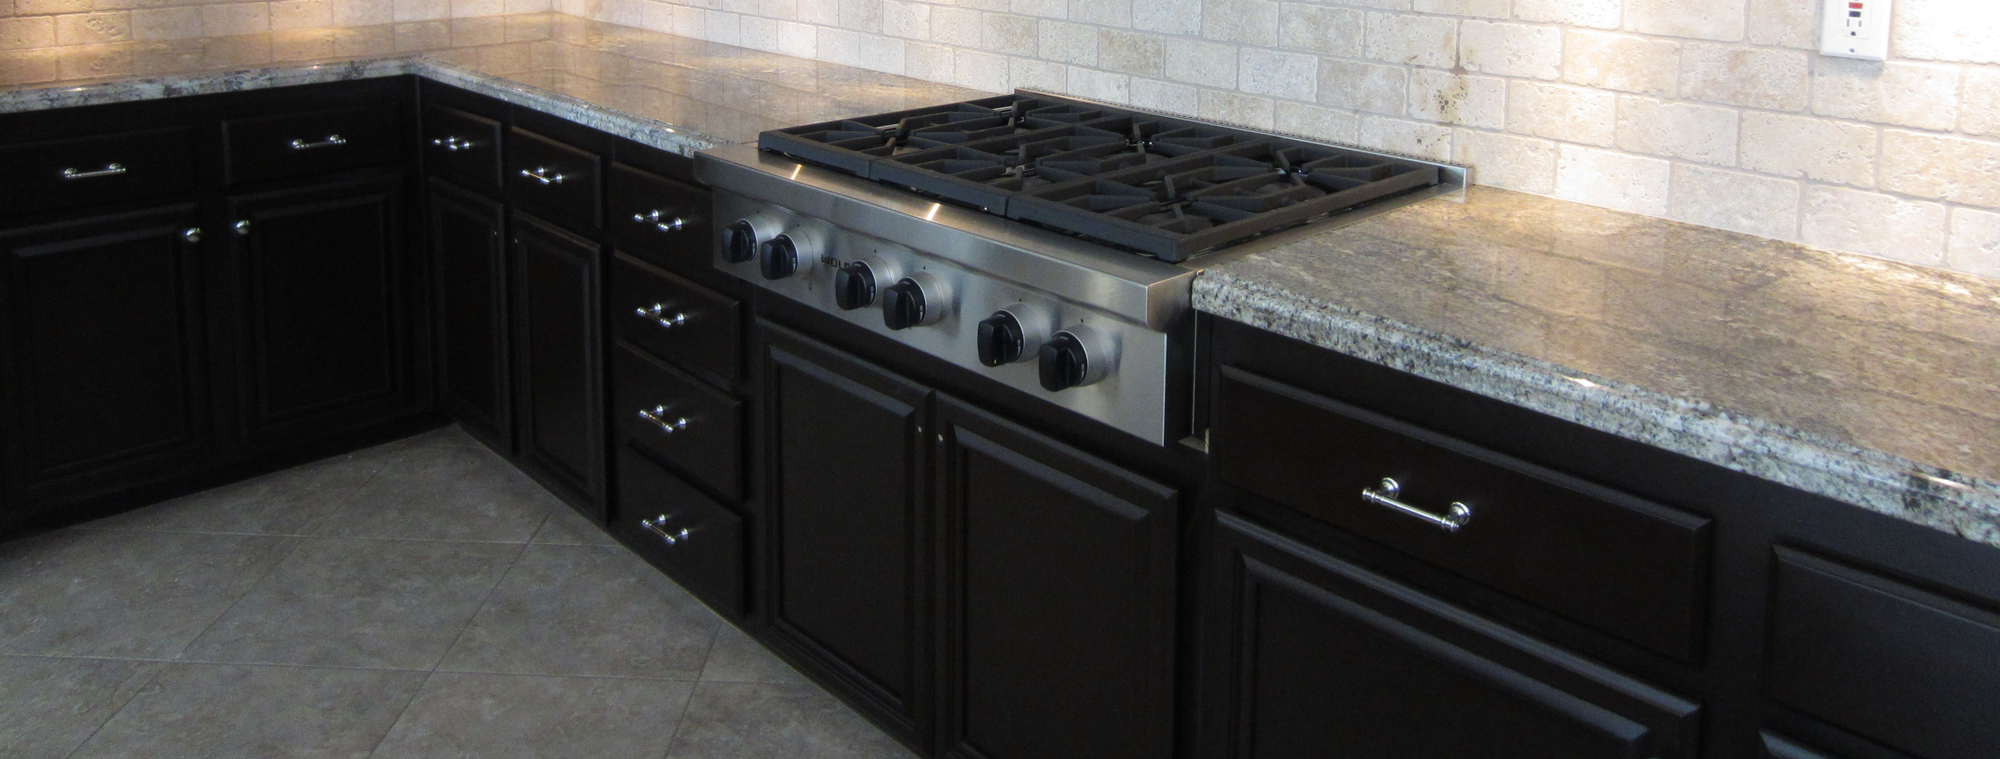 kitchen remodeling gilbert arizona - best kitchen remodels